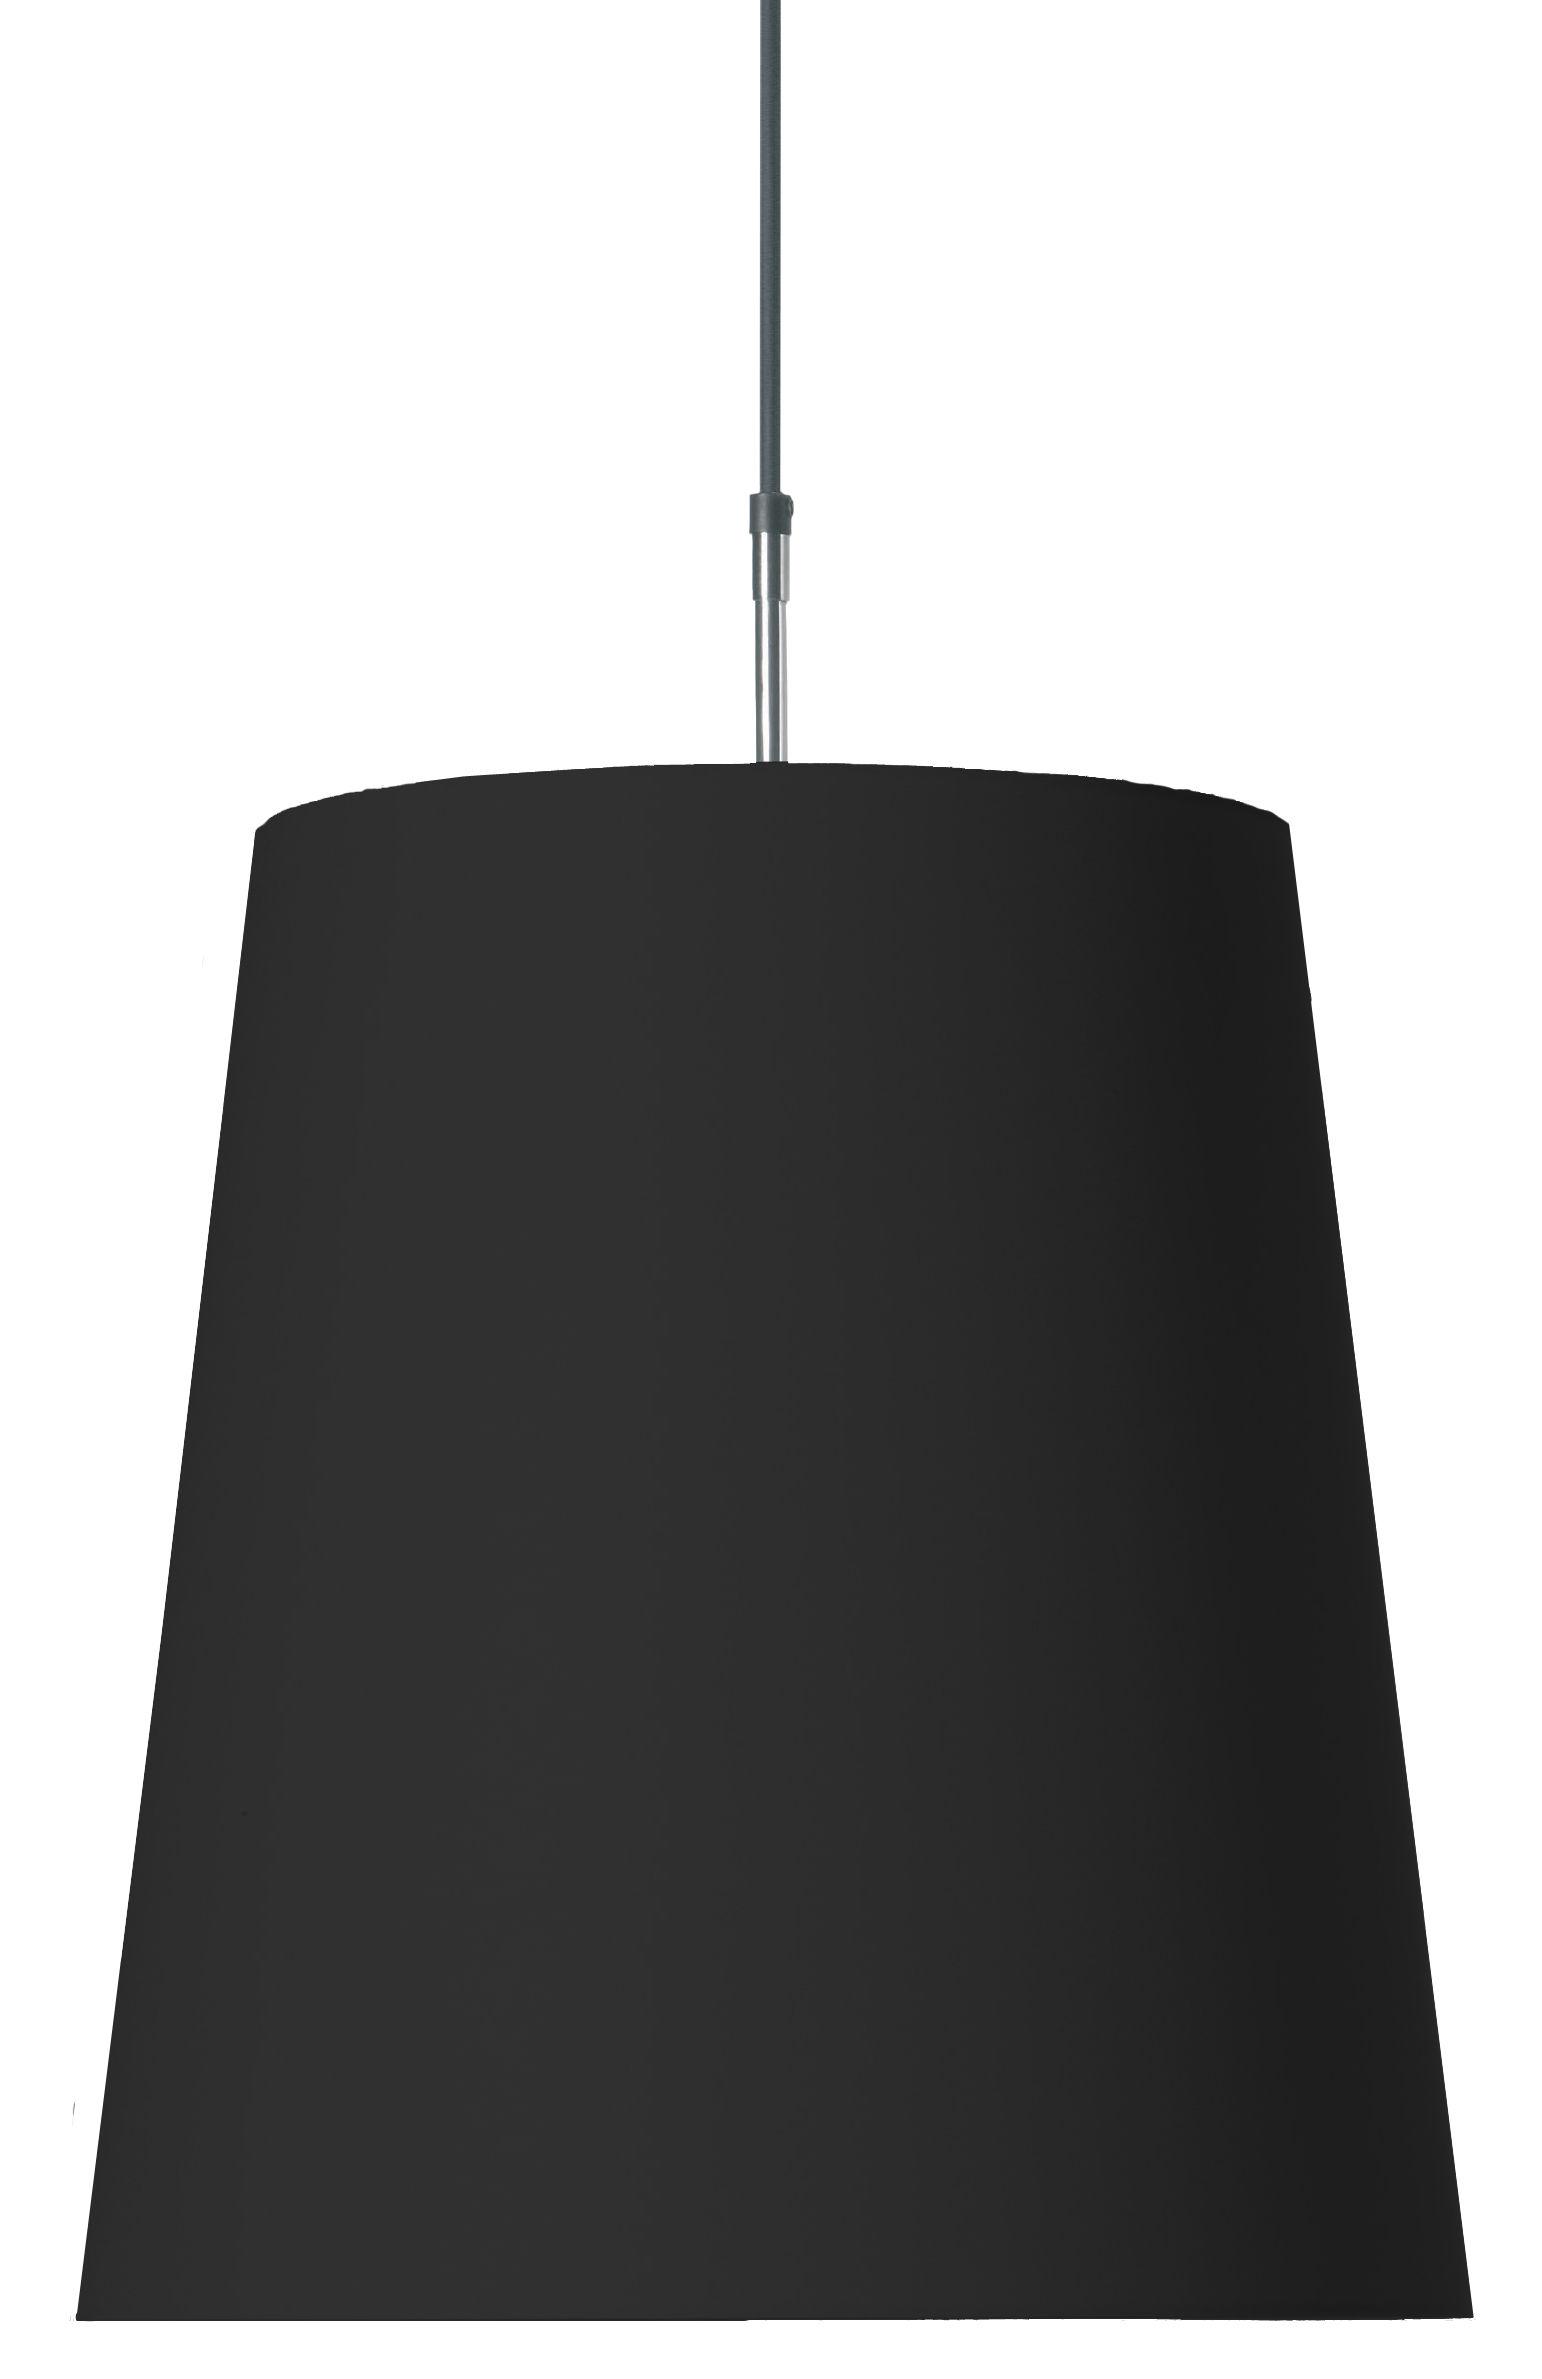 Lighting - Pendant Lighting - Round Light Pendant by Moooi - Black - Cotton